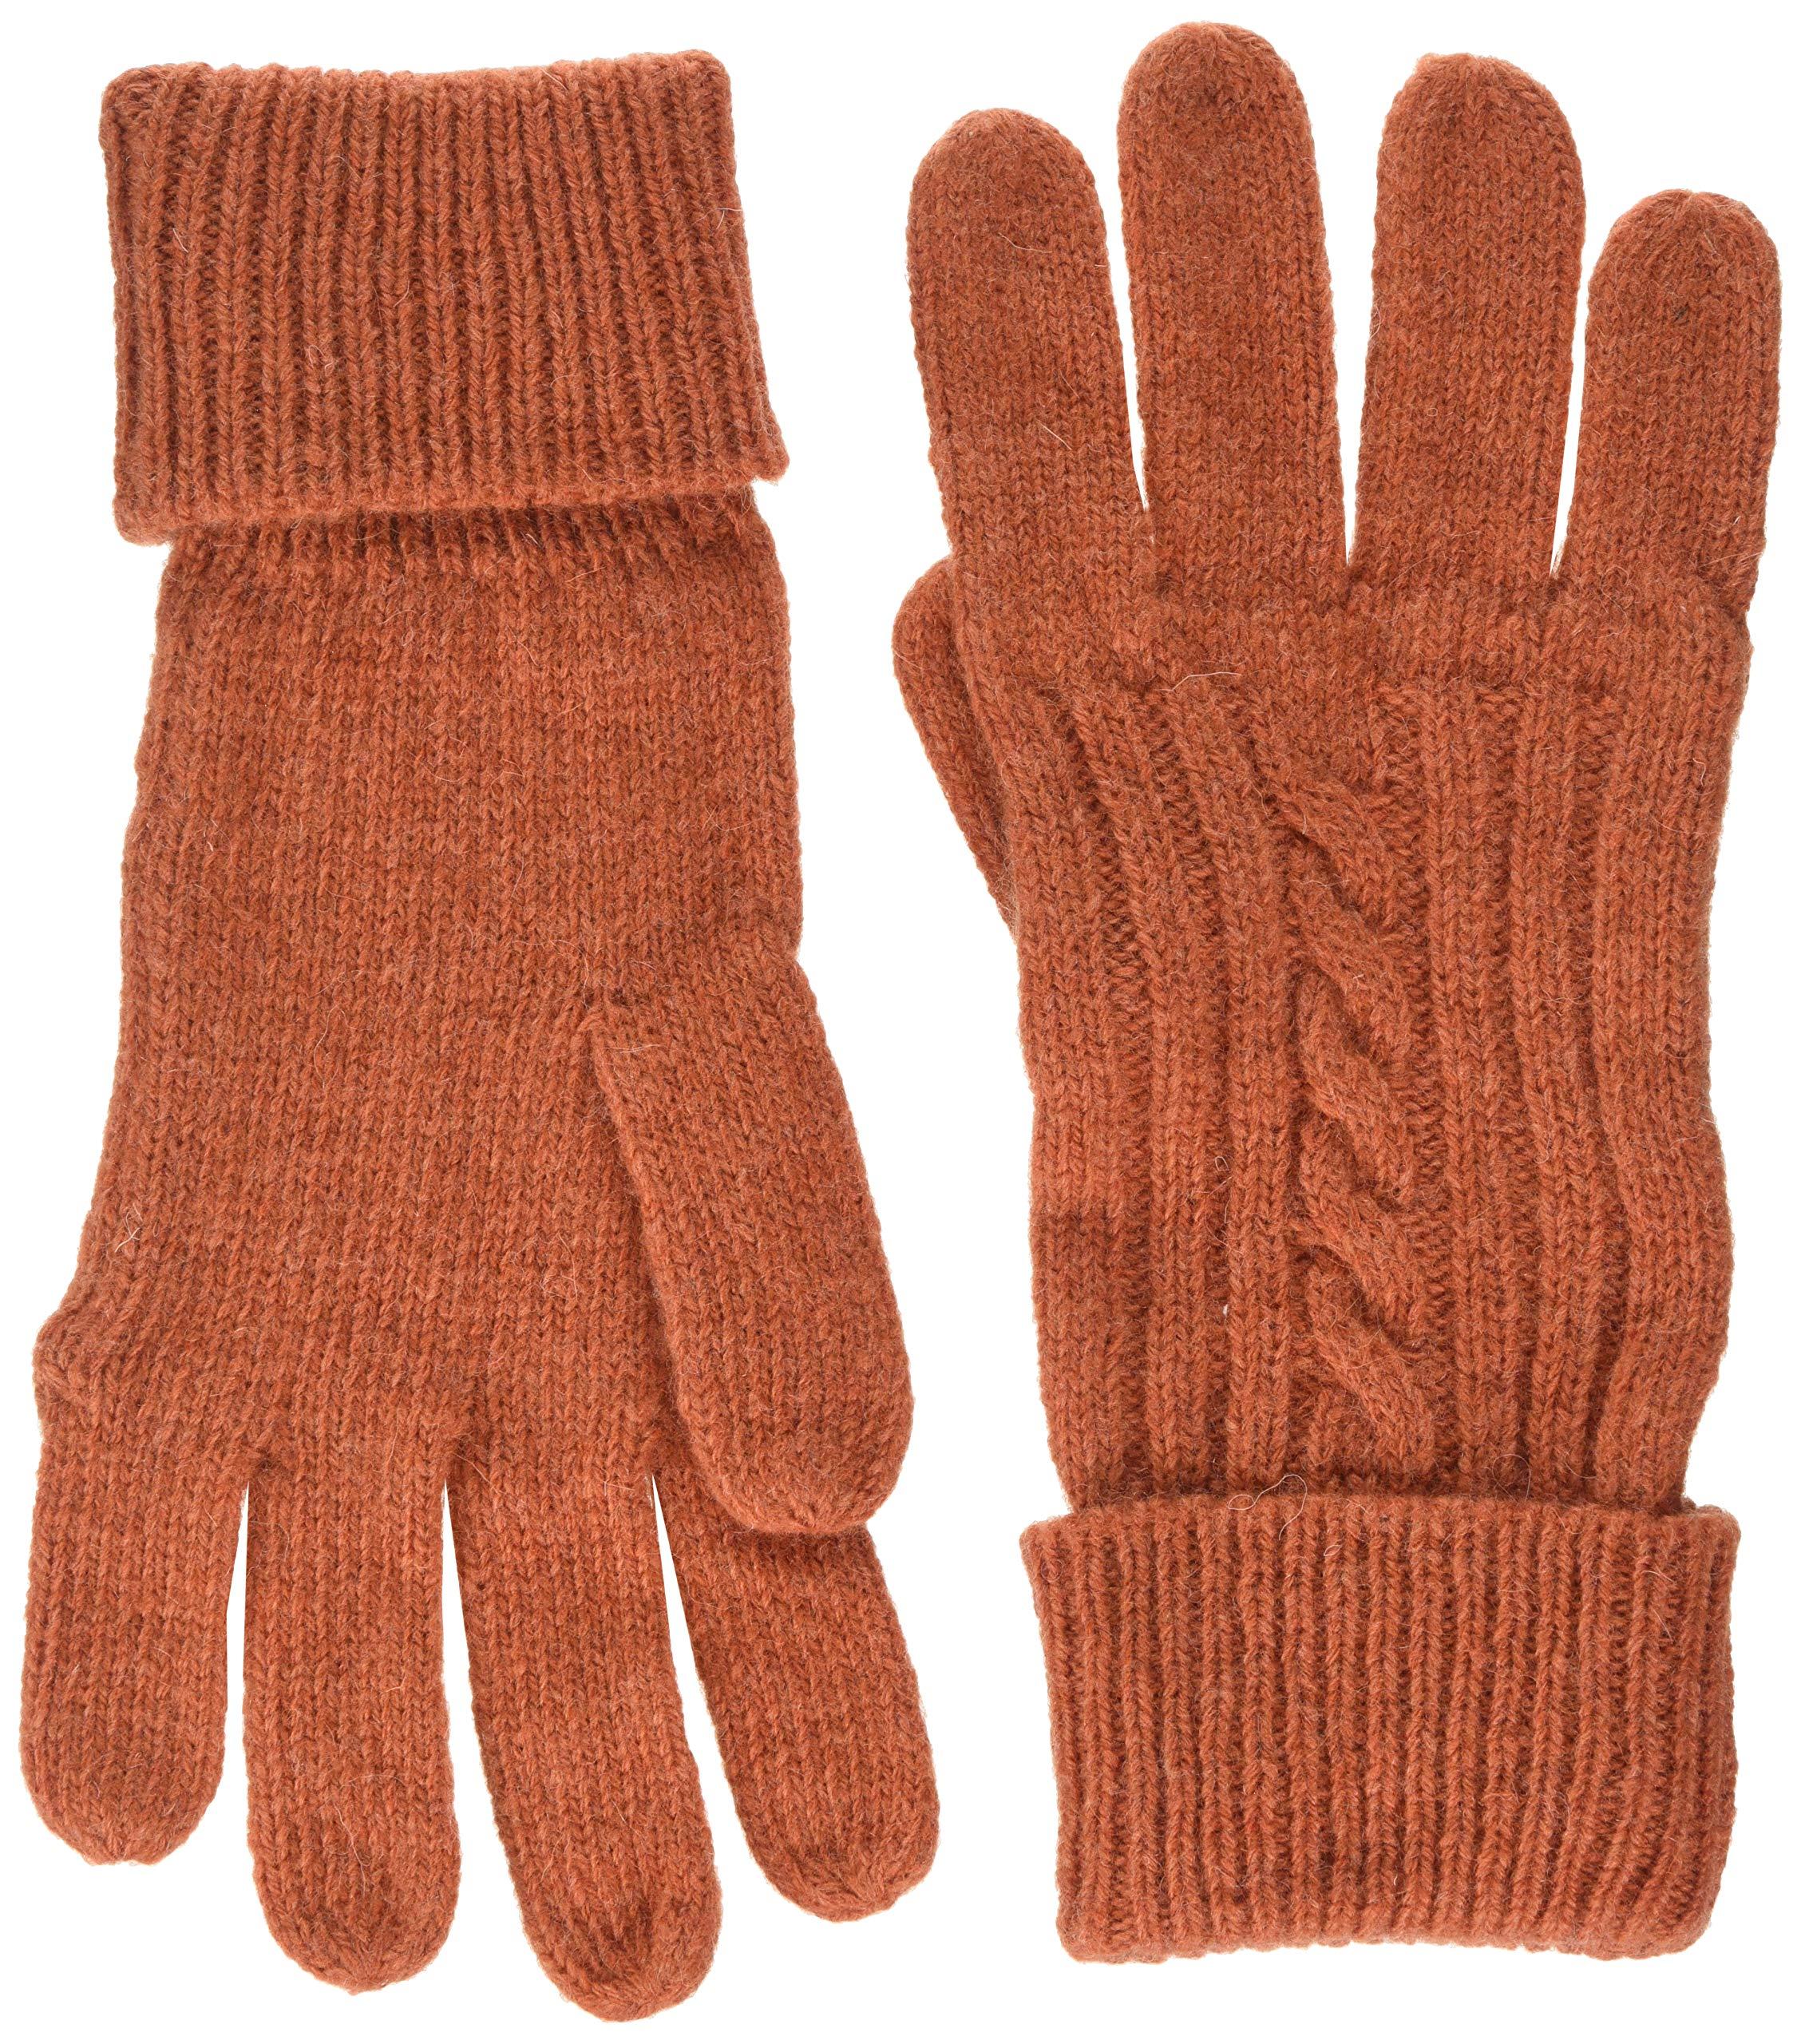 O2Cable Unique Knit Gant OchreTaille GlovesOrangeburnt Femme CQrshtxd